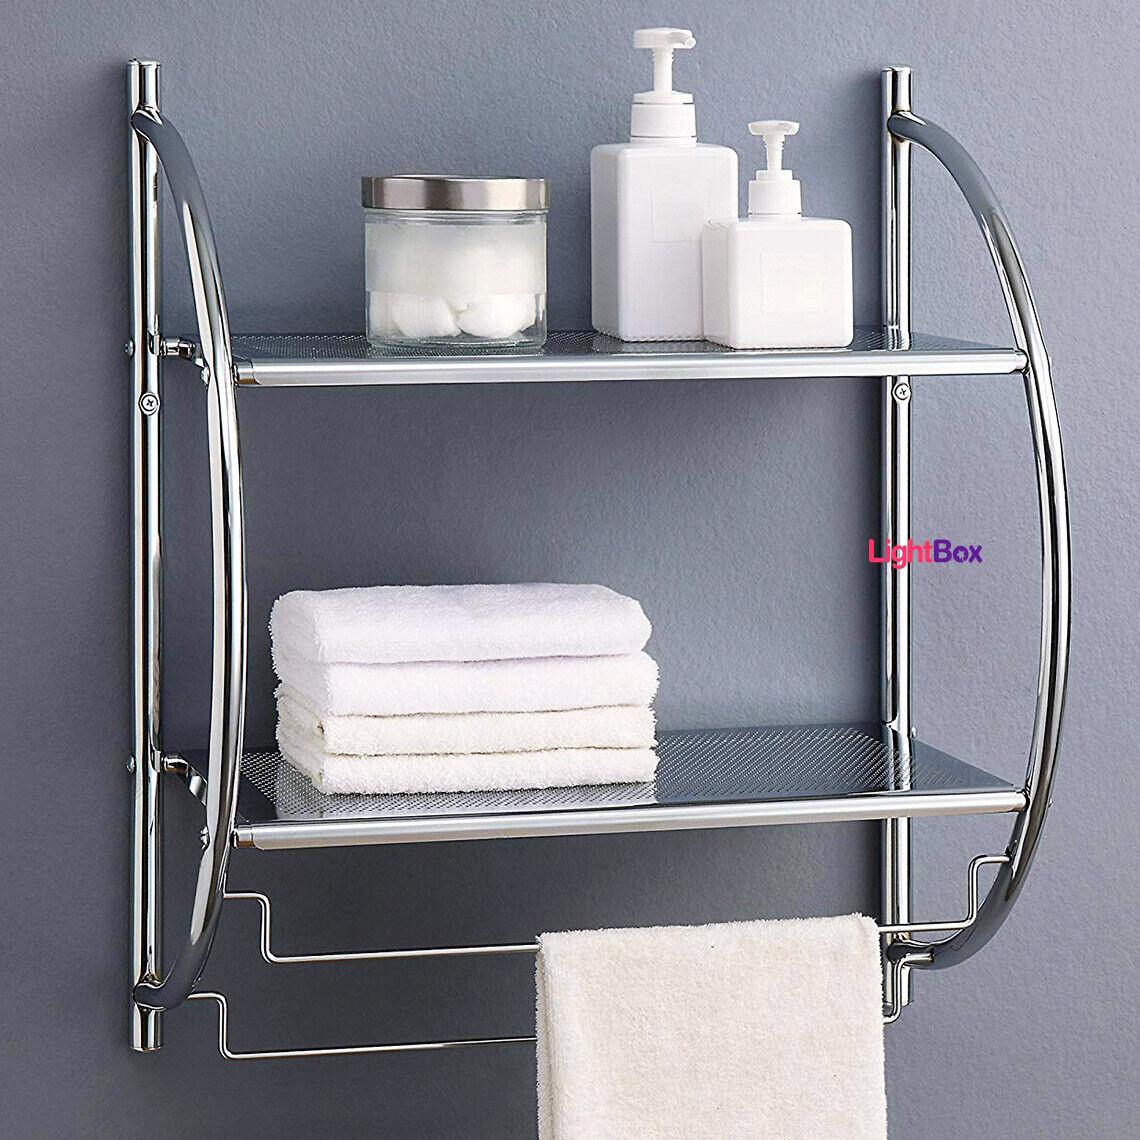 Towel Rack 2 Levels Bathroom Shelf Wall Mounted Storage Organizer Chrome Toilet For Sale Online